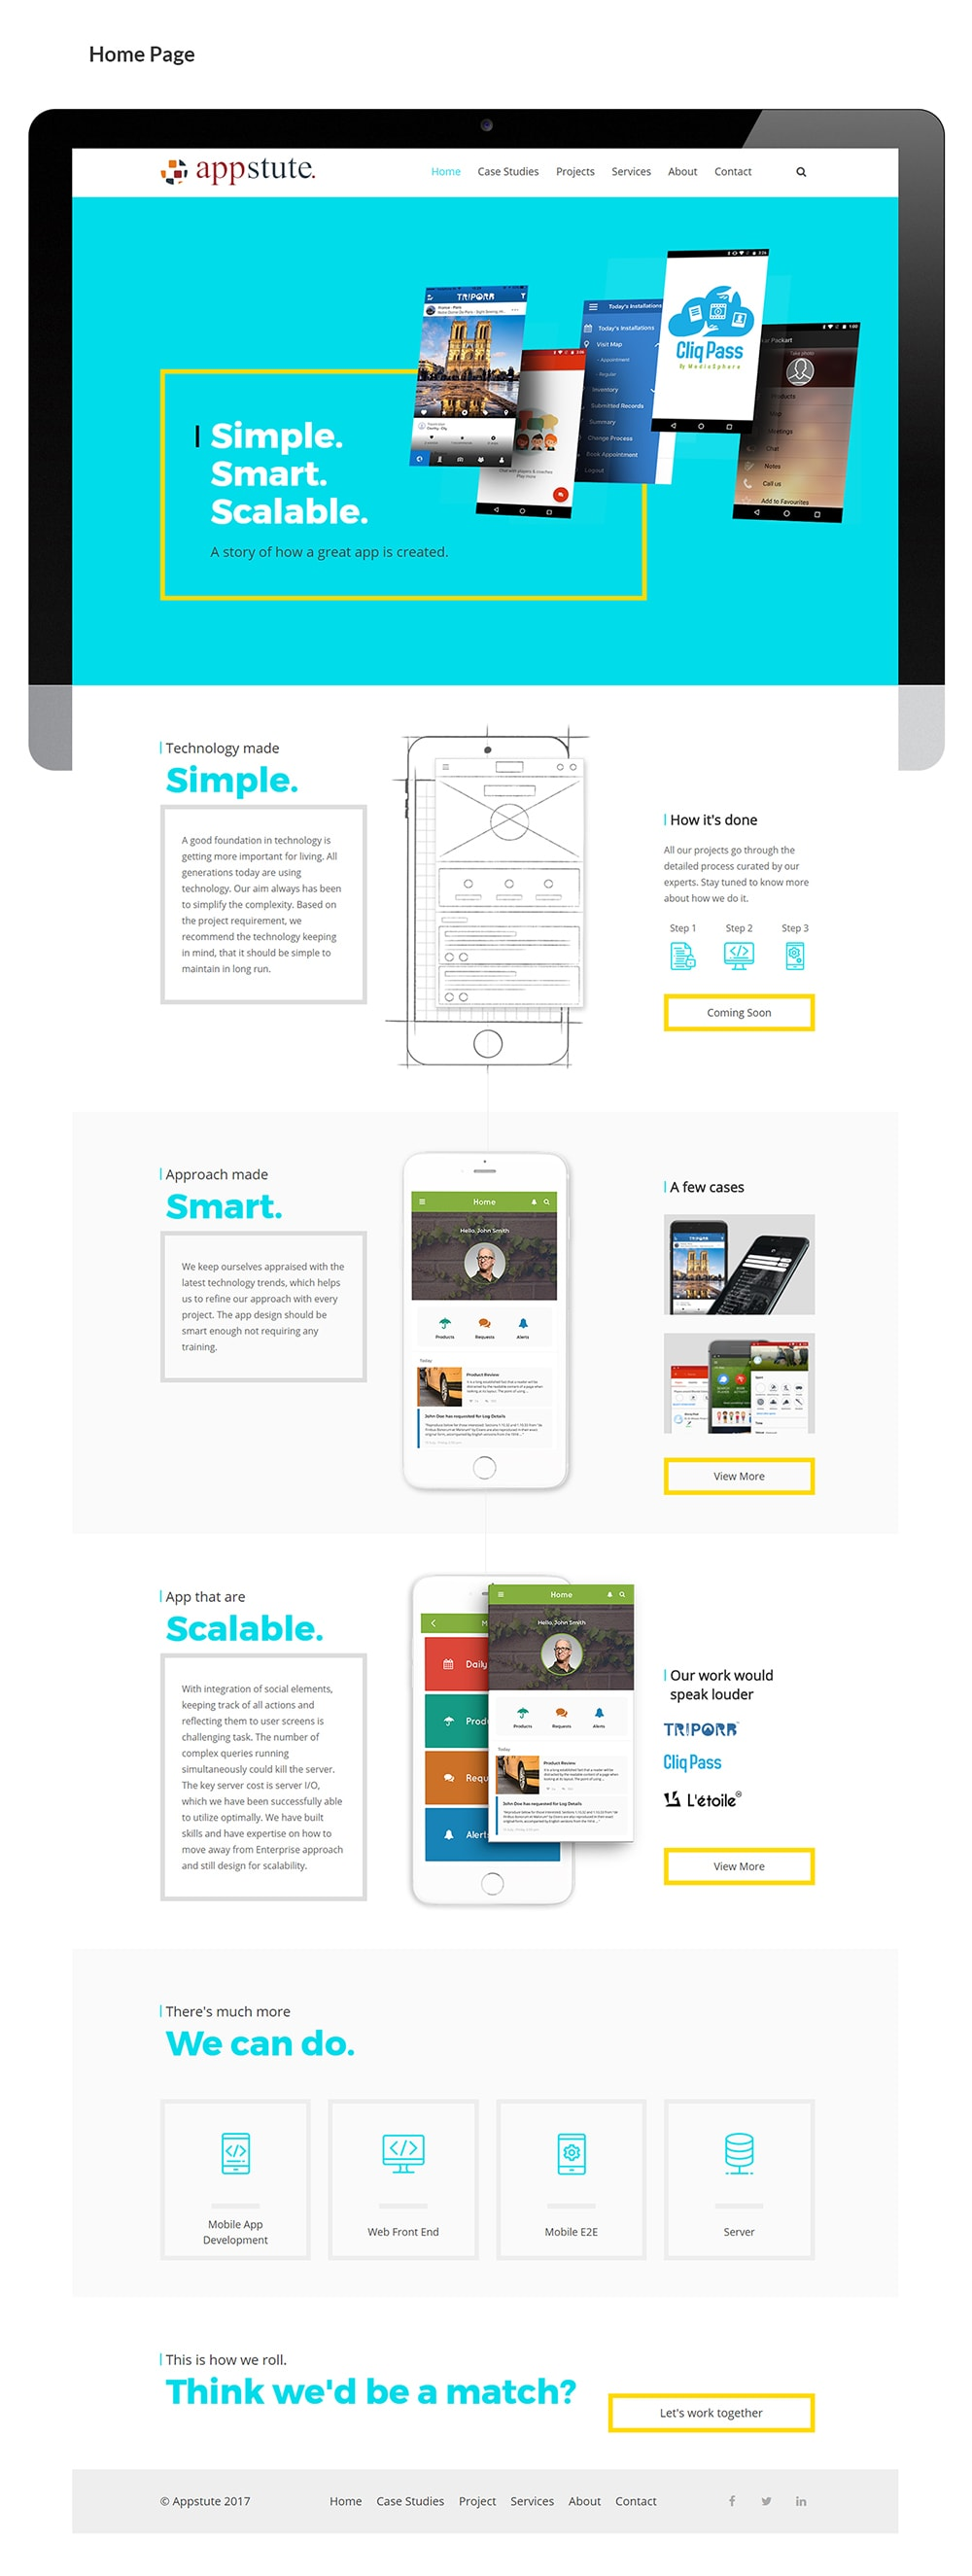 Appstute website home page design